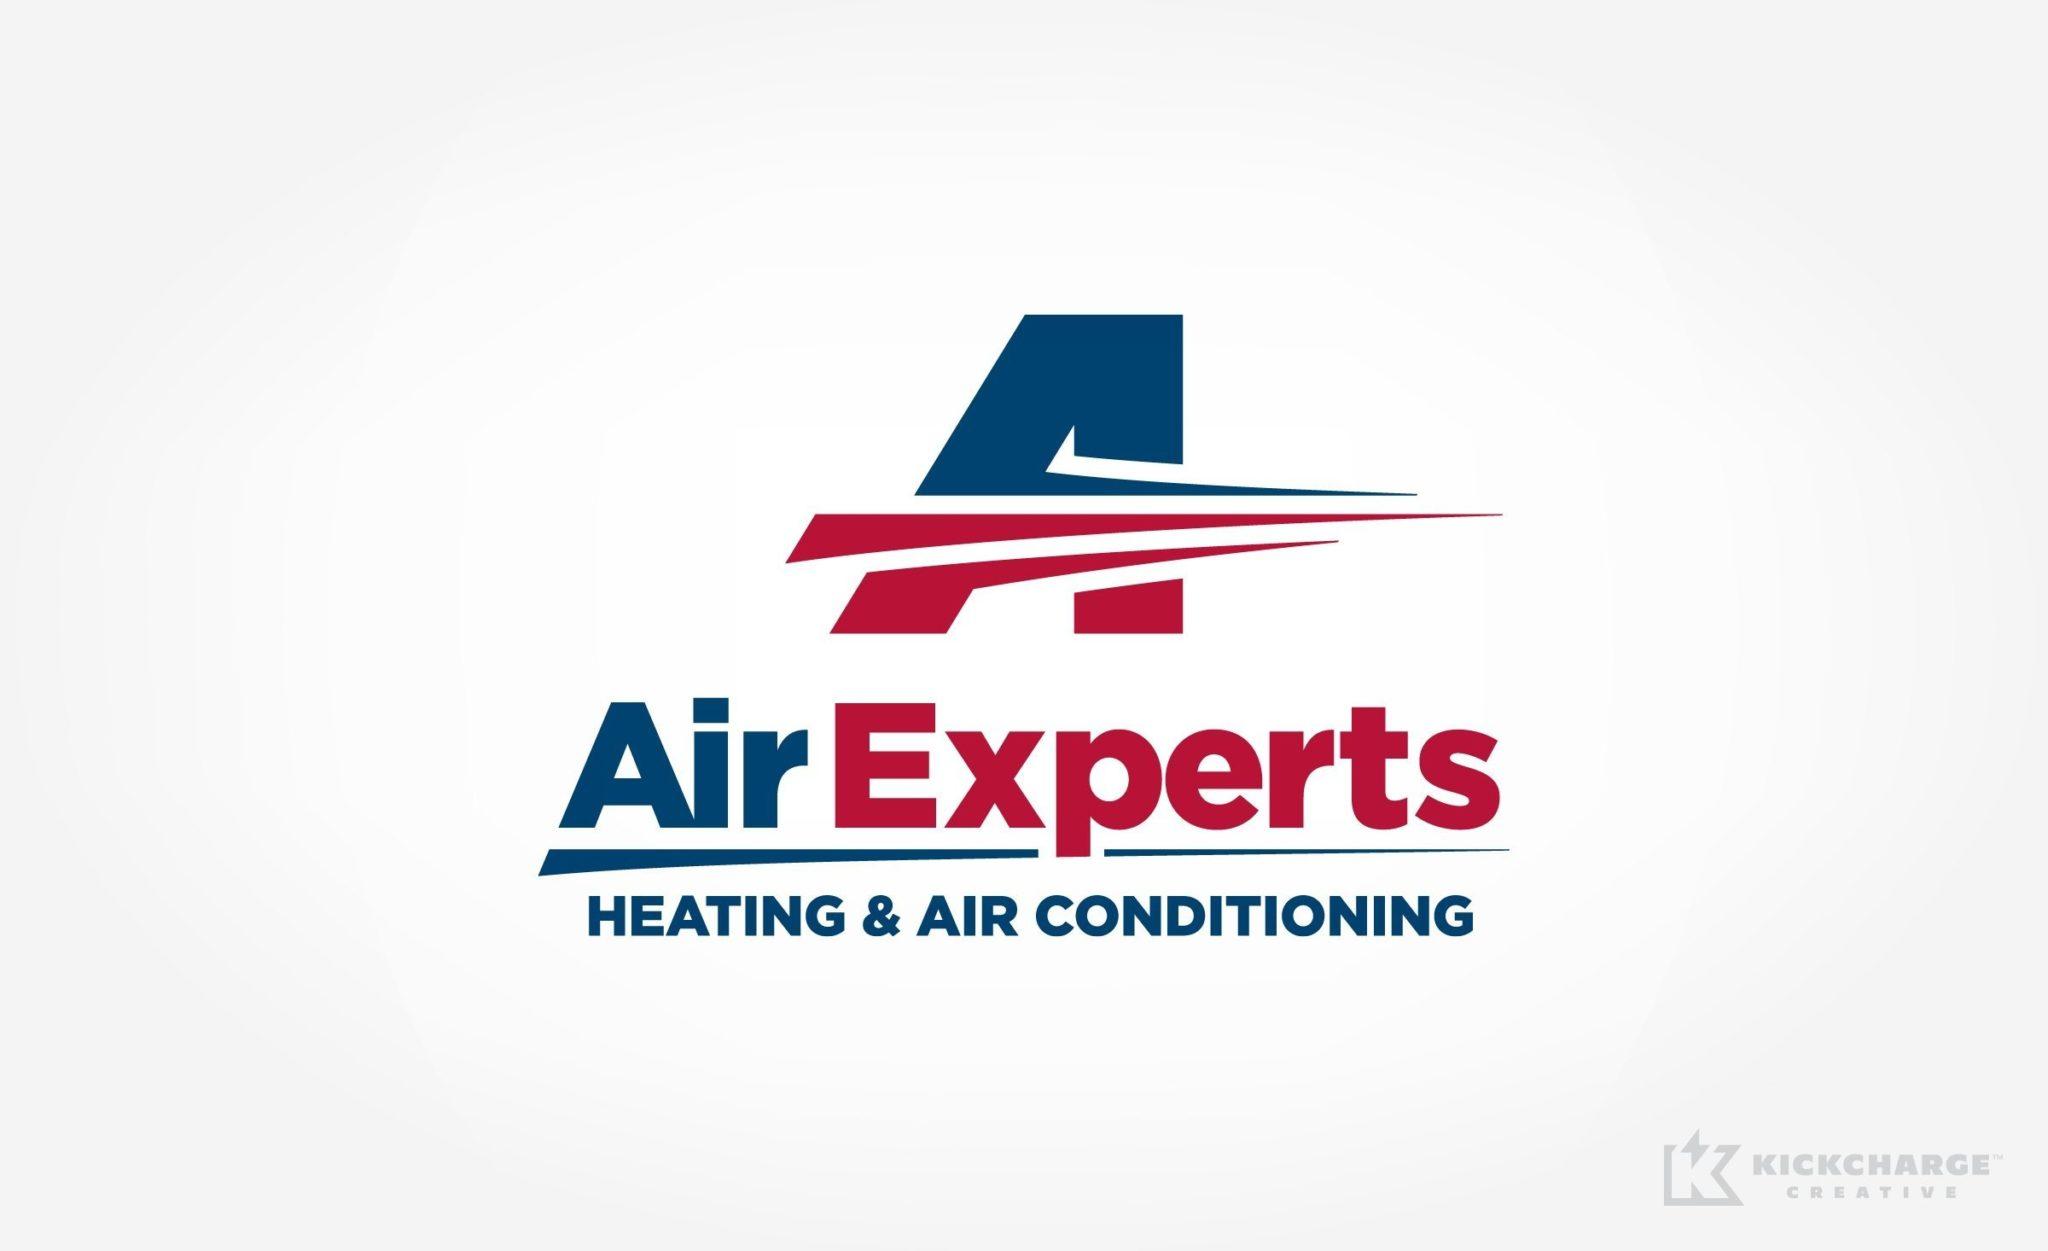 Air Experts Kickcharge Creative Kickcharge Com